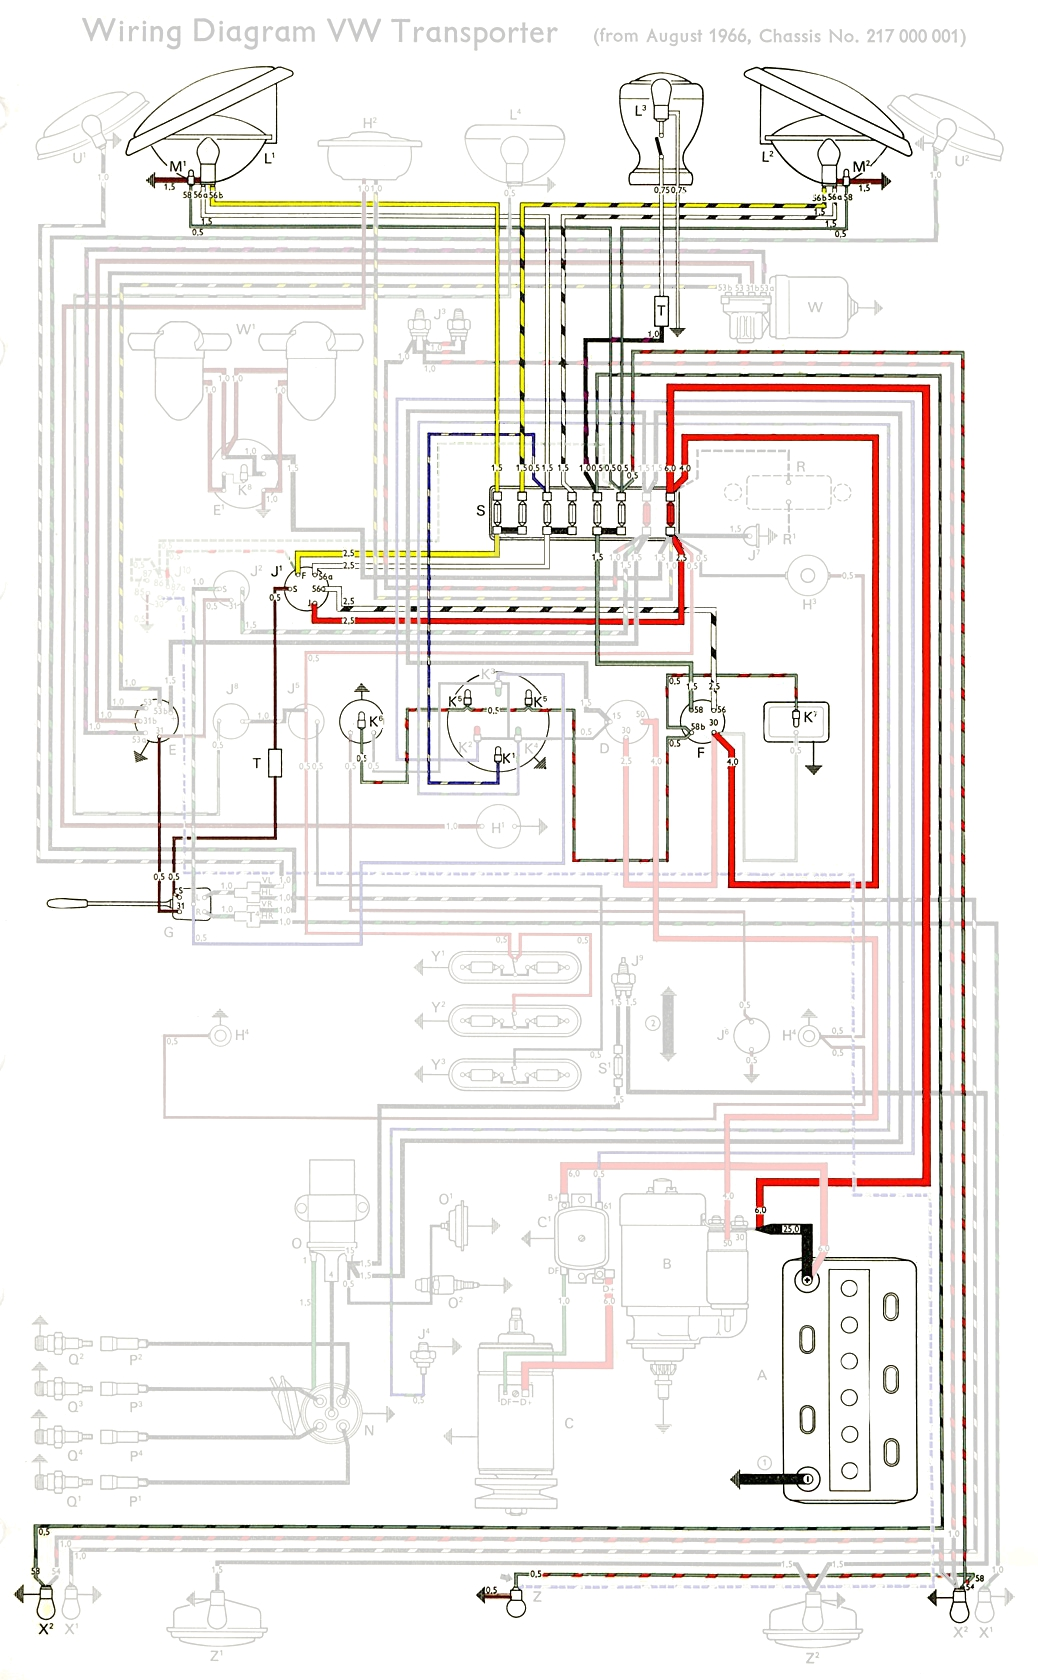 1966 vw bus wiring diagram home phone australia thesamba.com :: type 2 diagrams